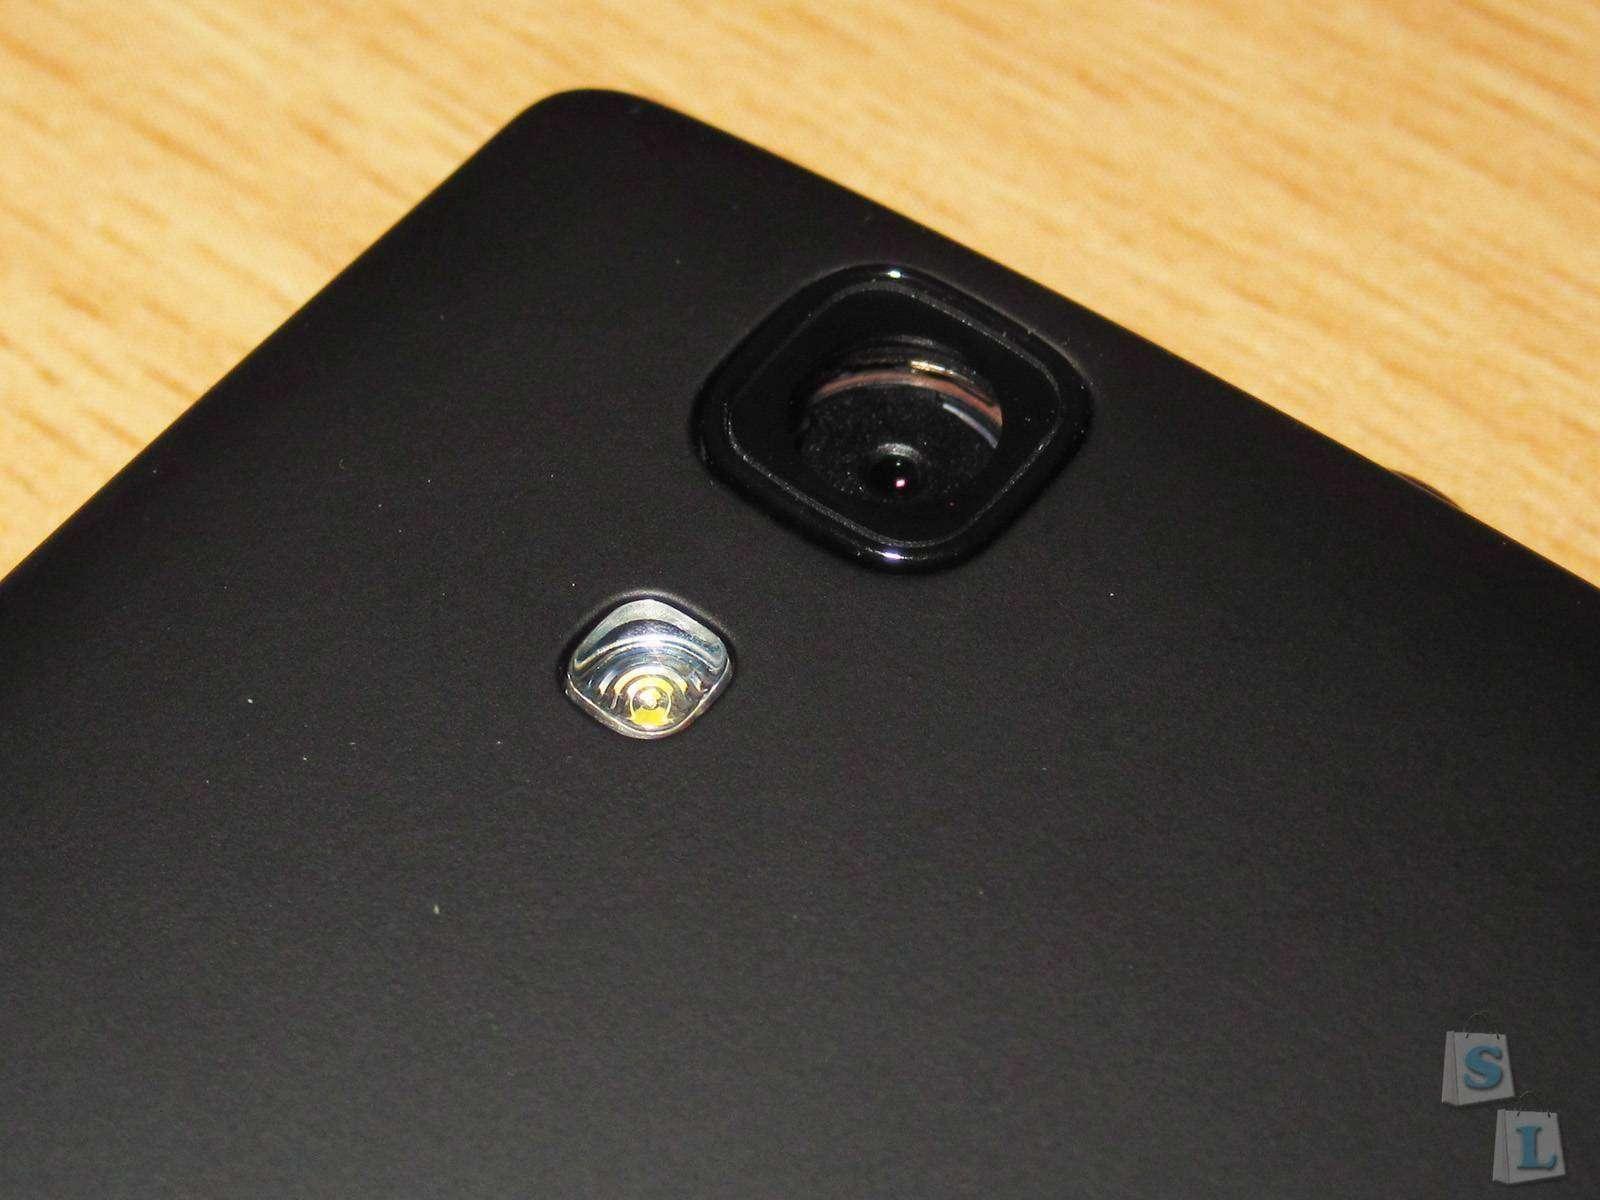 GearBest: DOOGEE X5 MAX, недорогой смартфон с Андроид 6